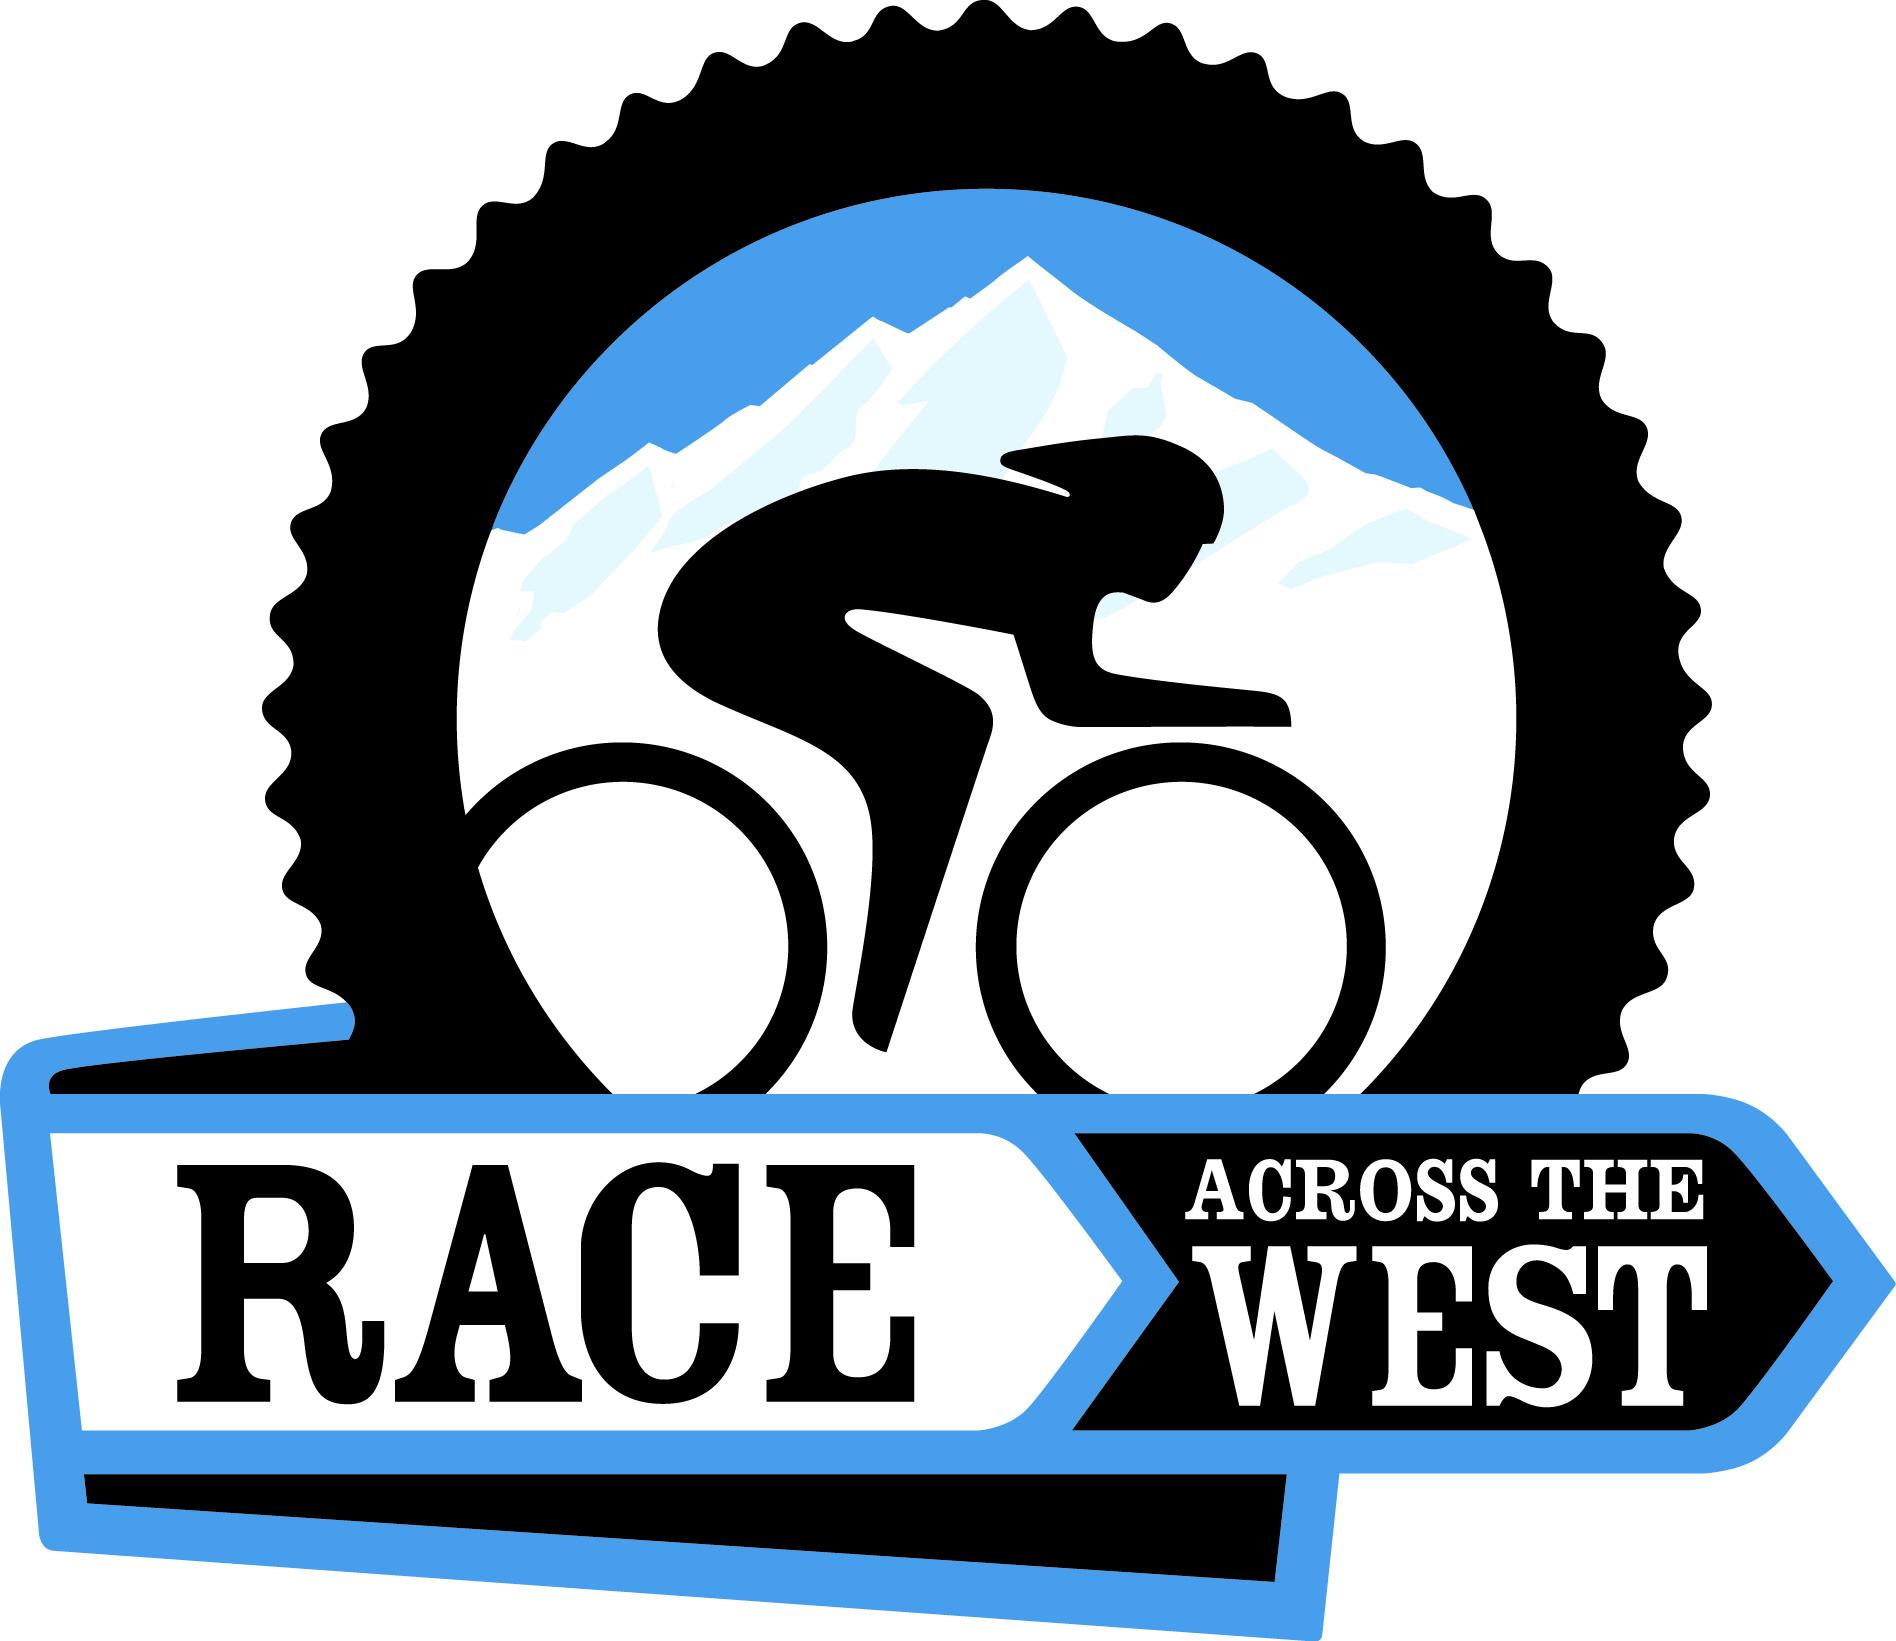 Bike event clipart #2